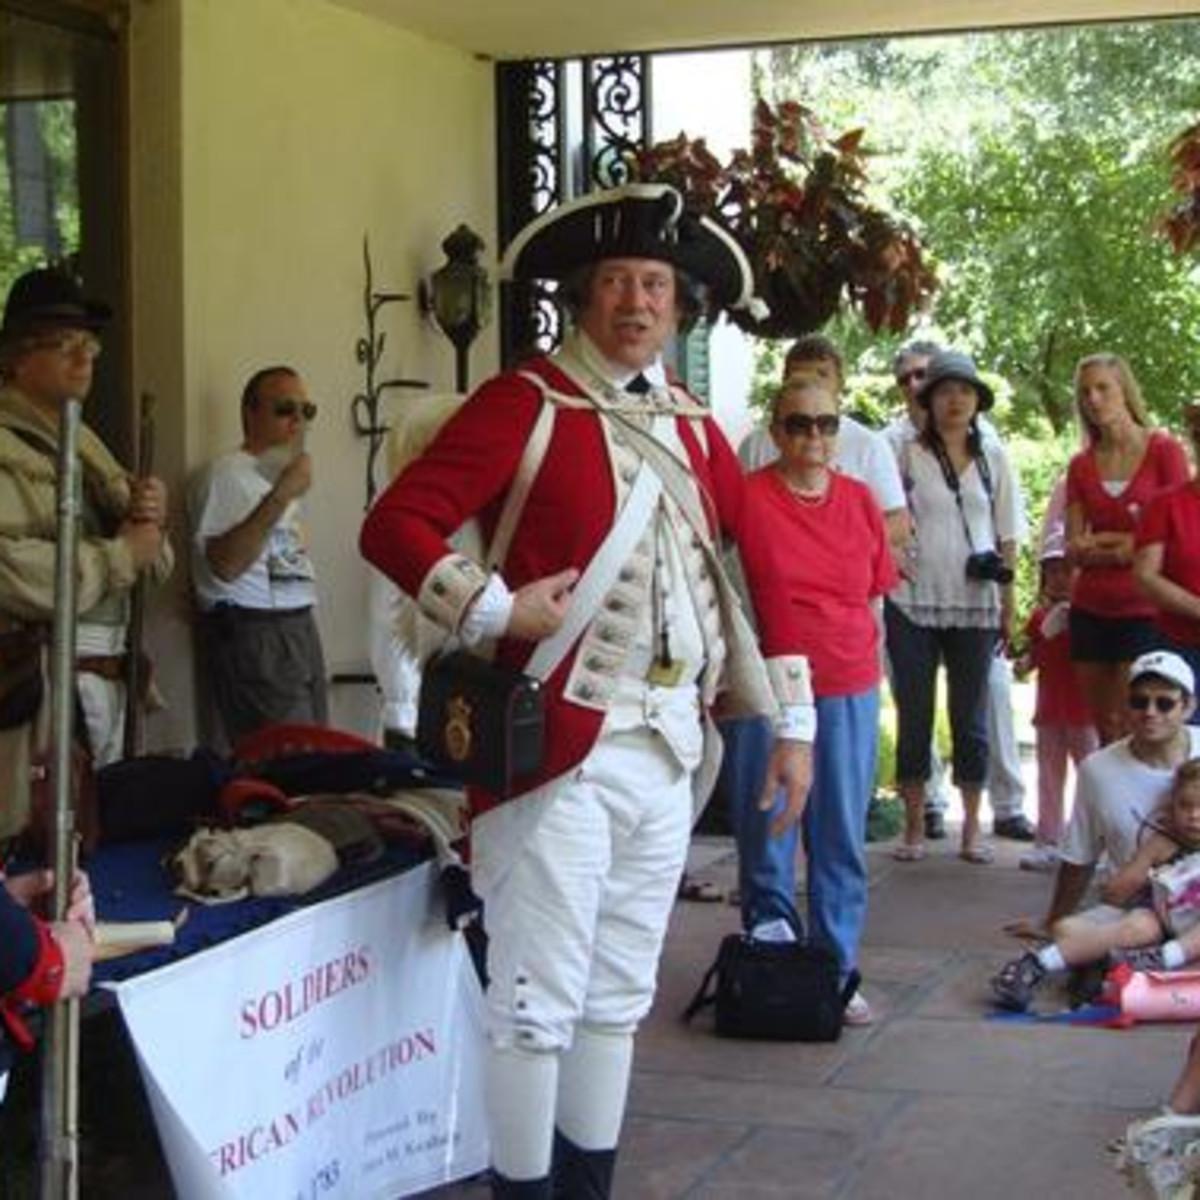 Fourth of July Celebration at Bayou Bend